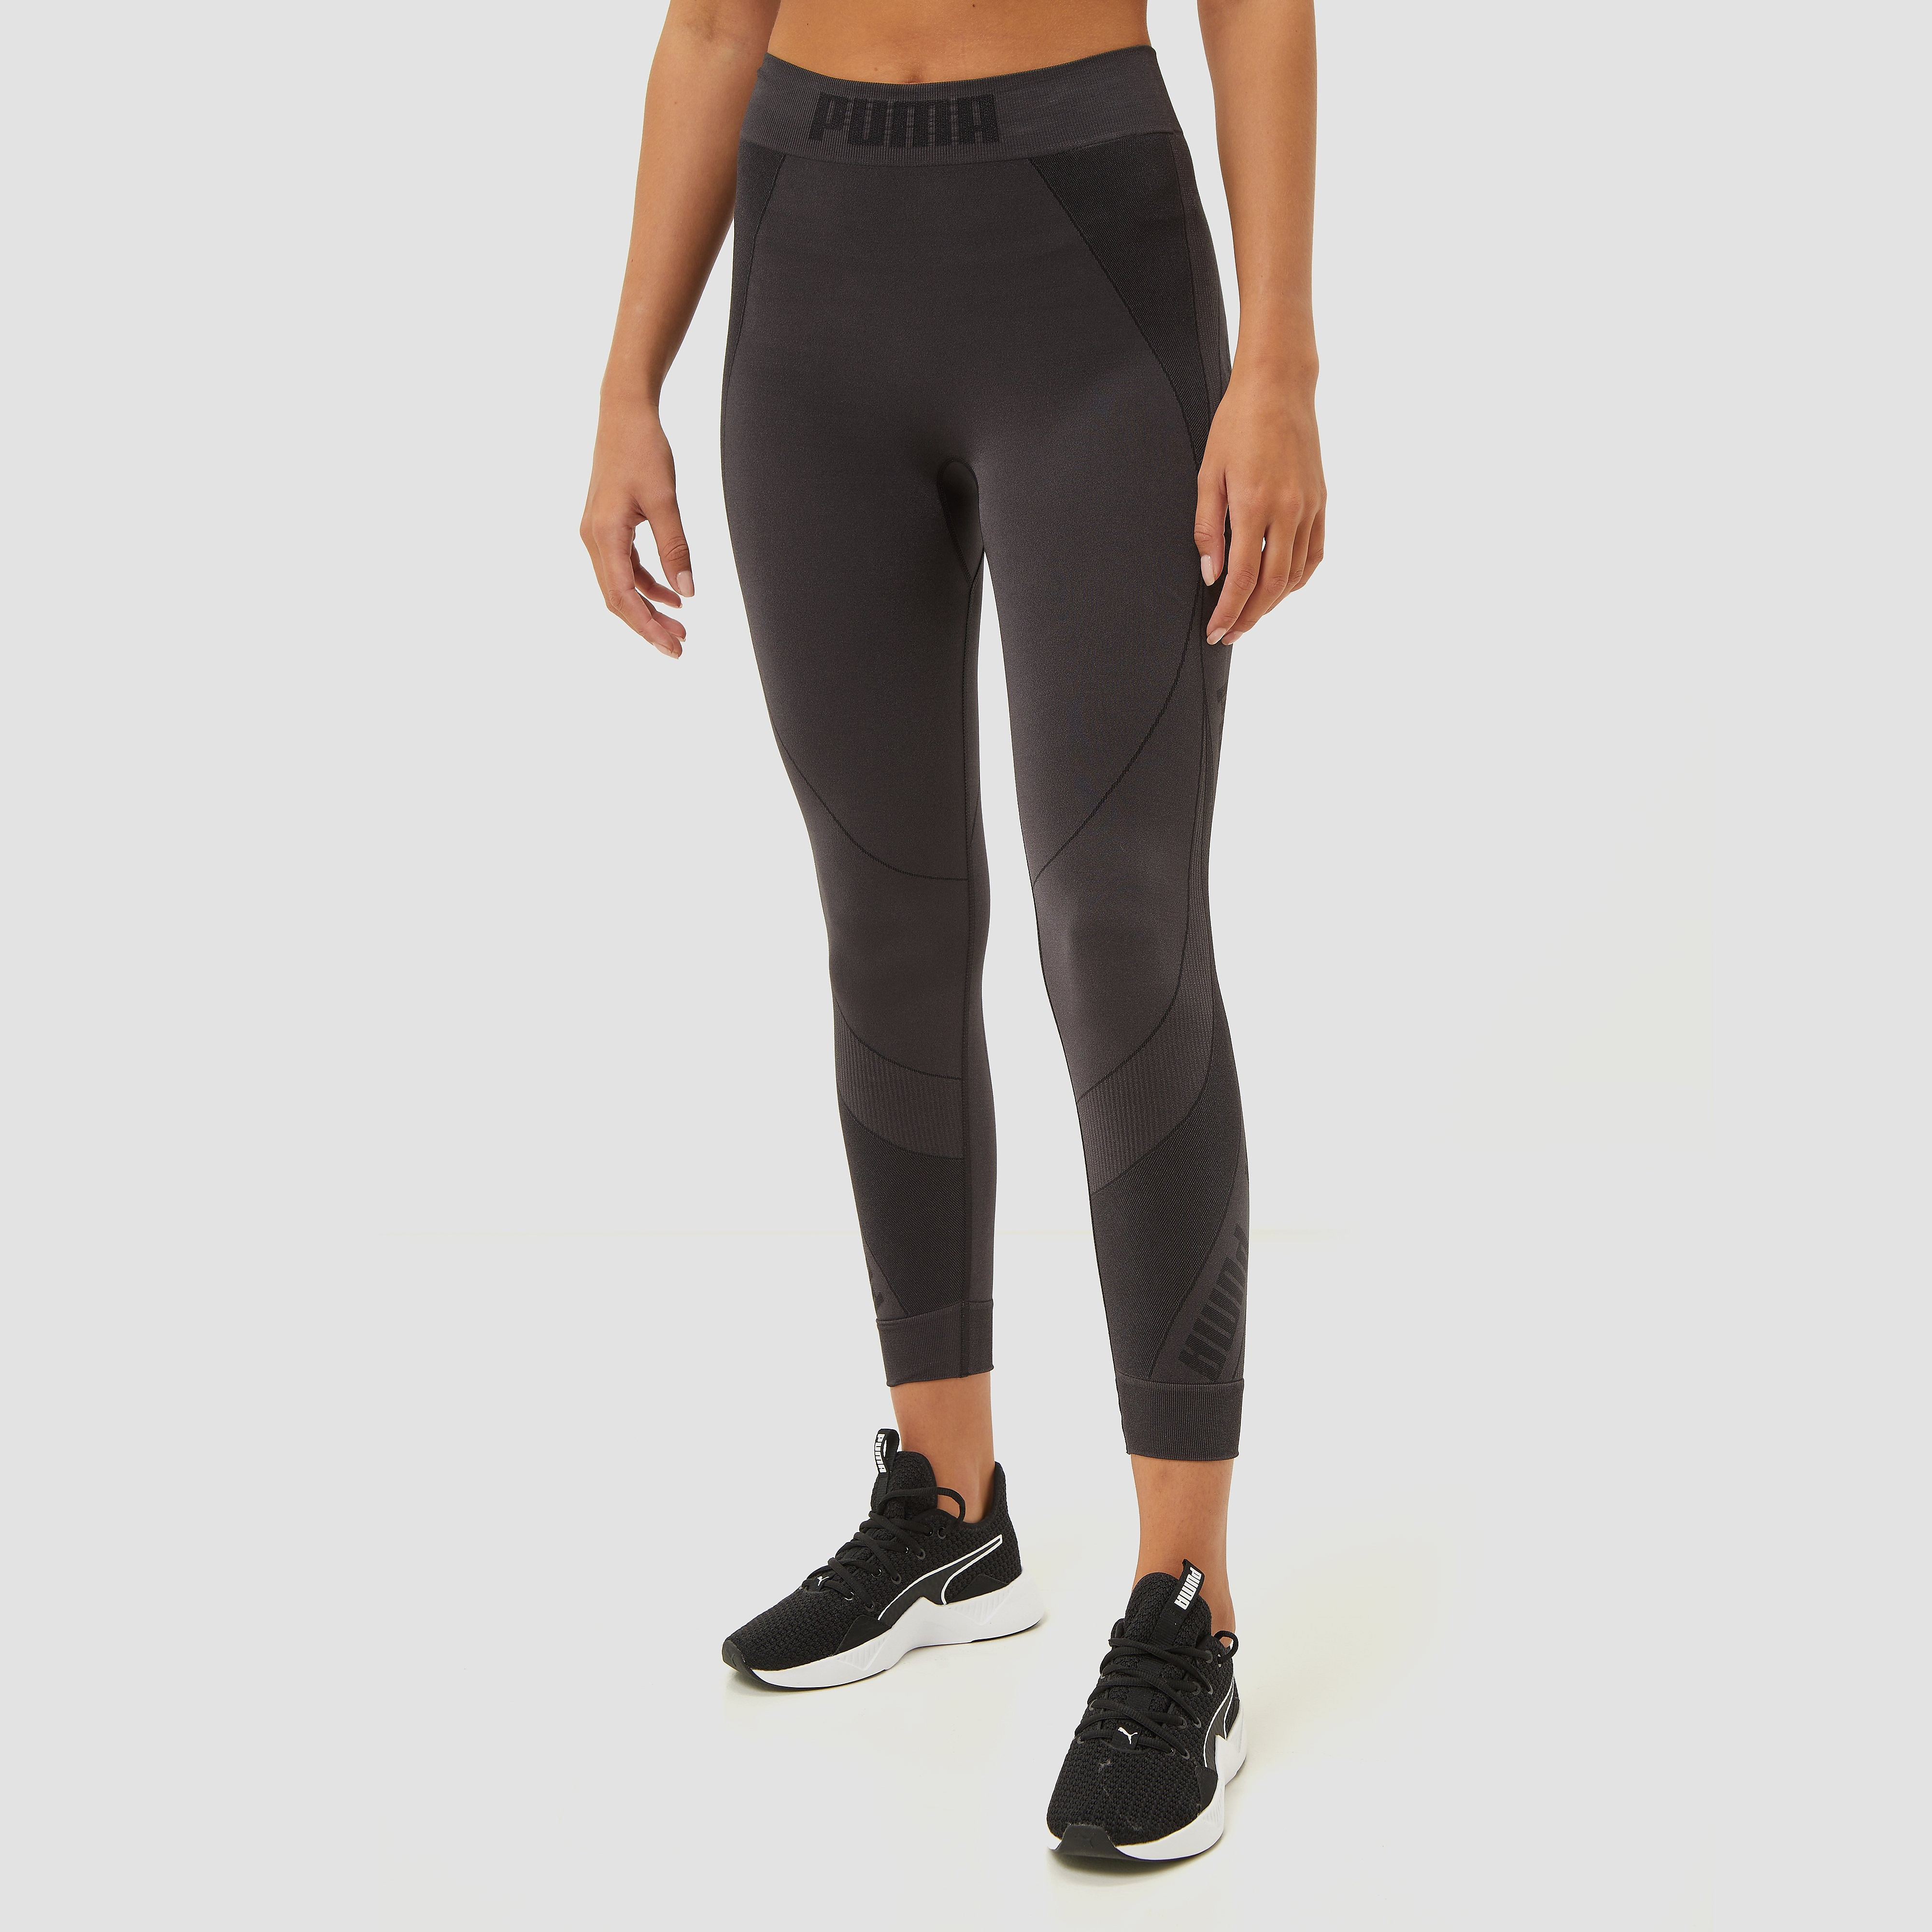 Puma Puma evostripe evoknit 7/8 legging zwart dames dames